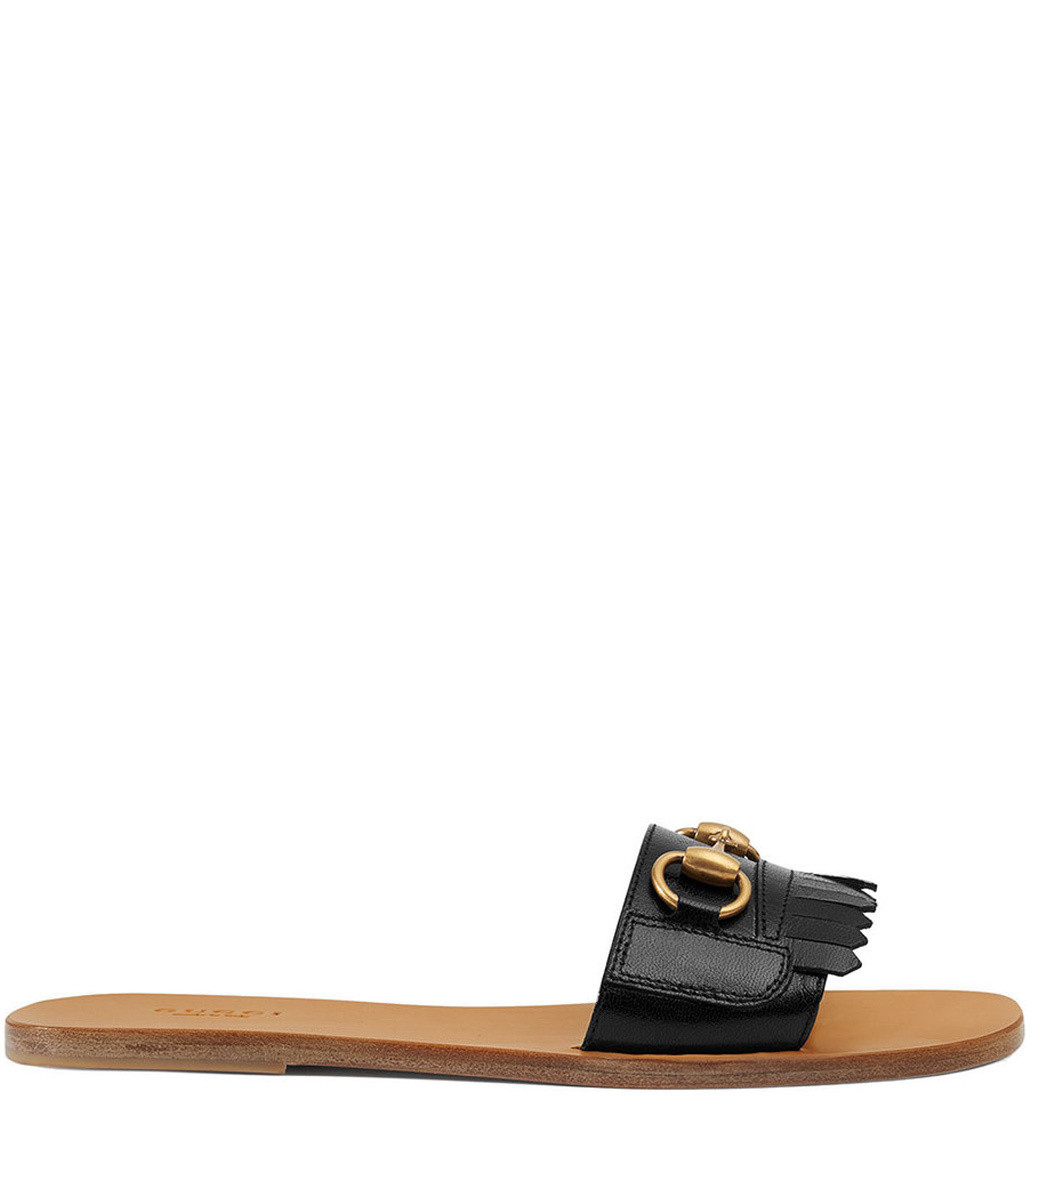 Gucci Varadero Fringed Slides , Black Leather Slides